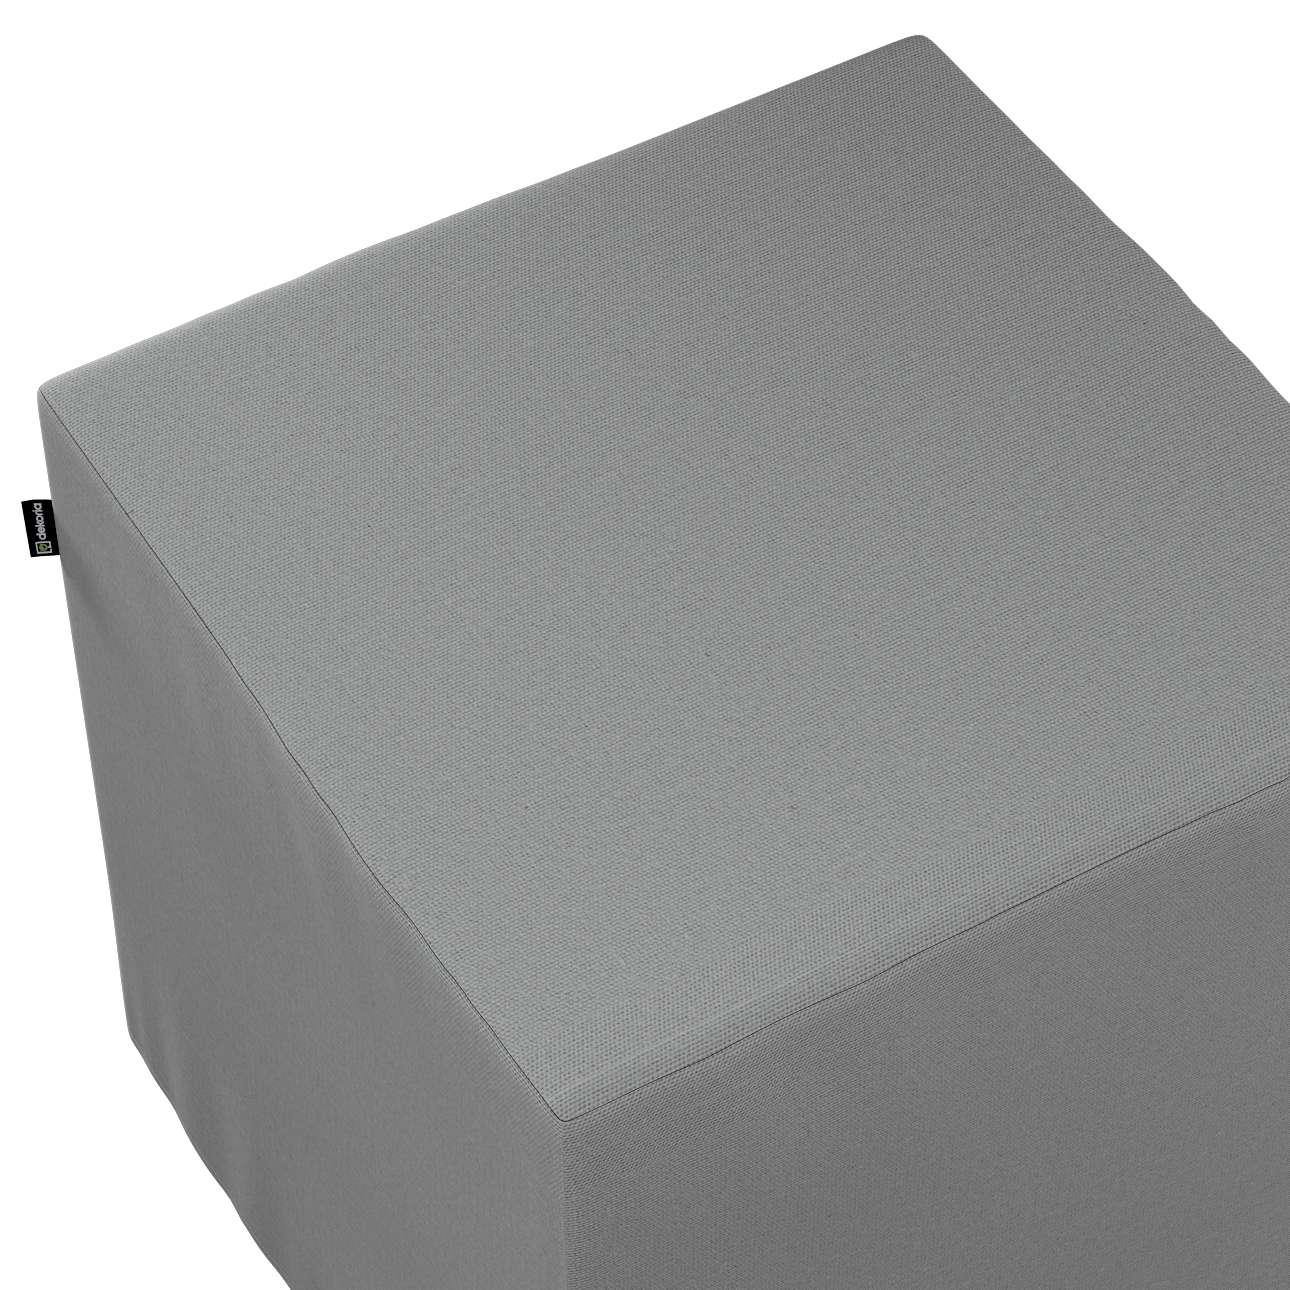 Pufa kostka w kolekcji Loneta, tkanina: 133-24